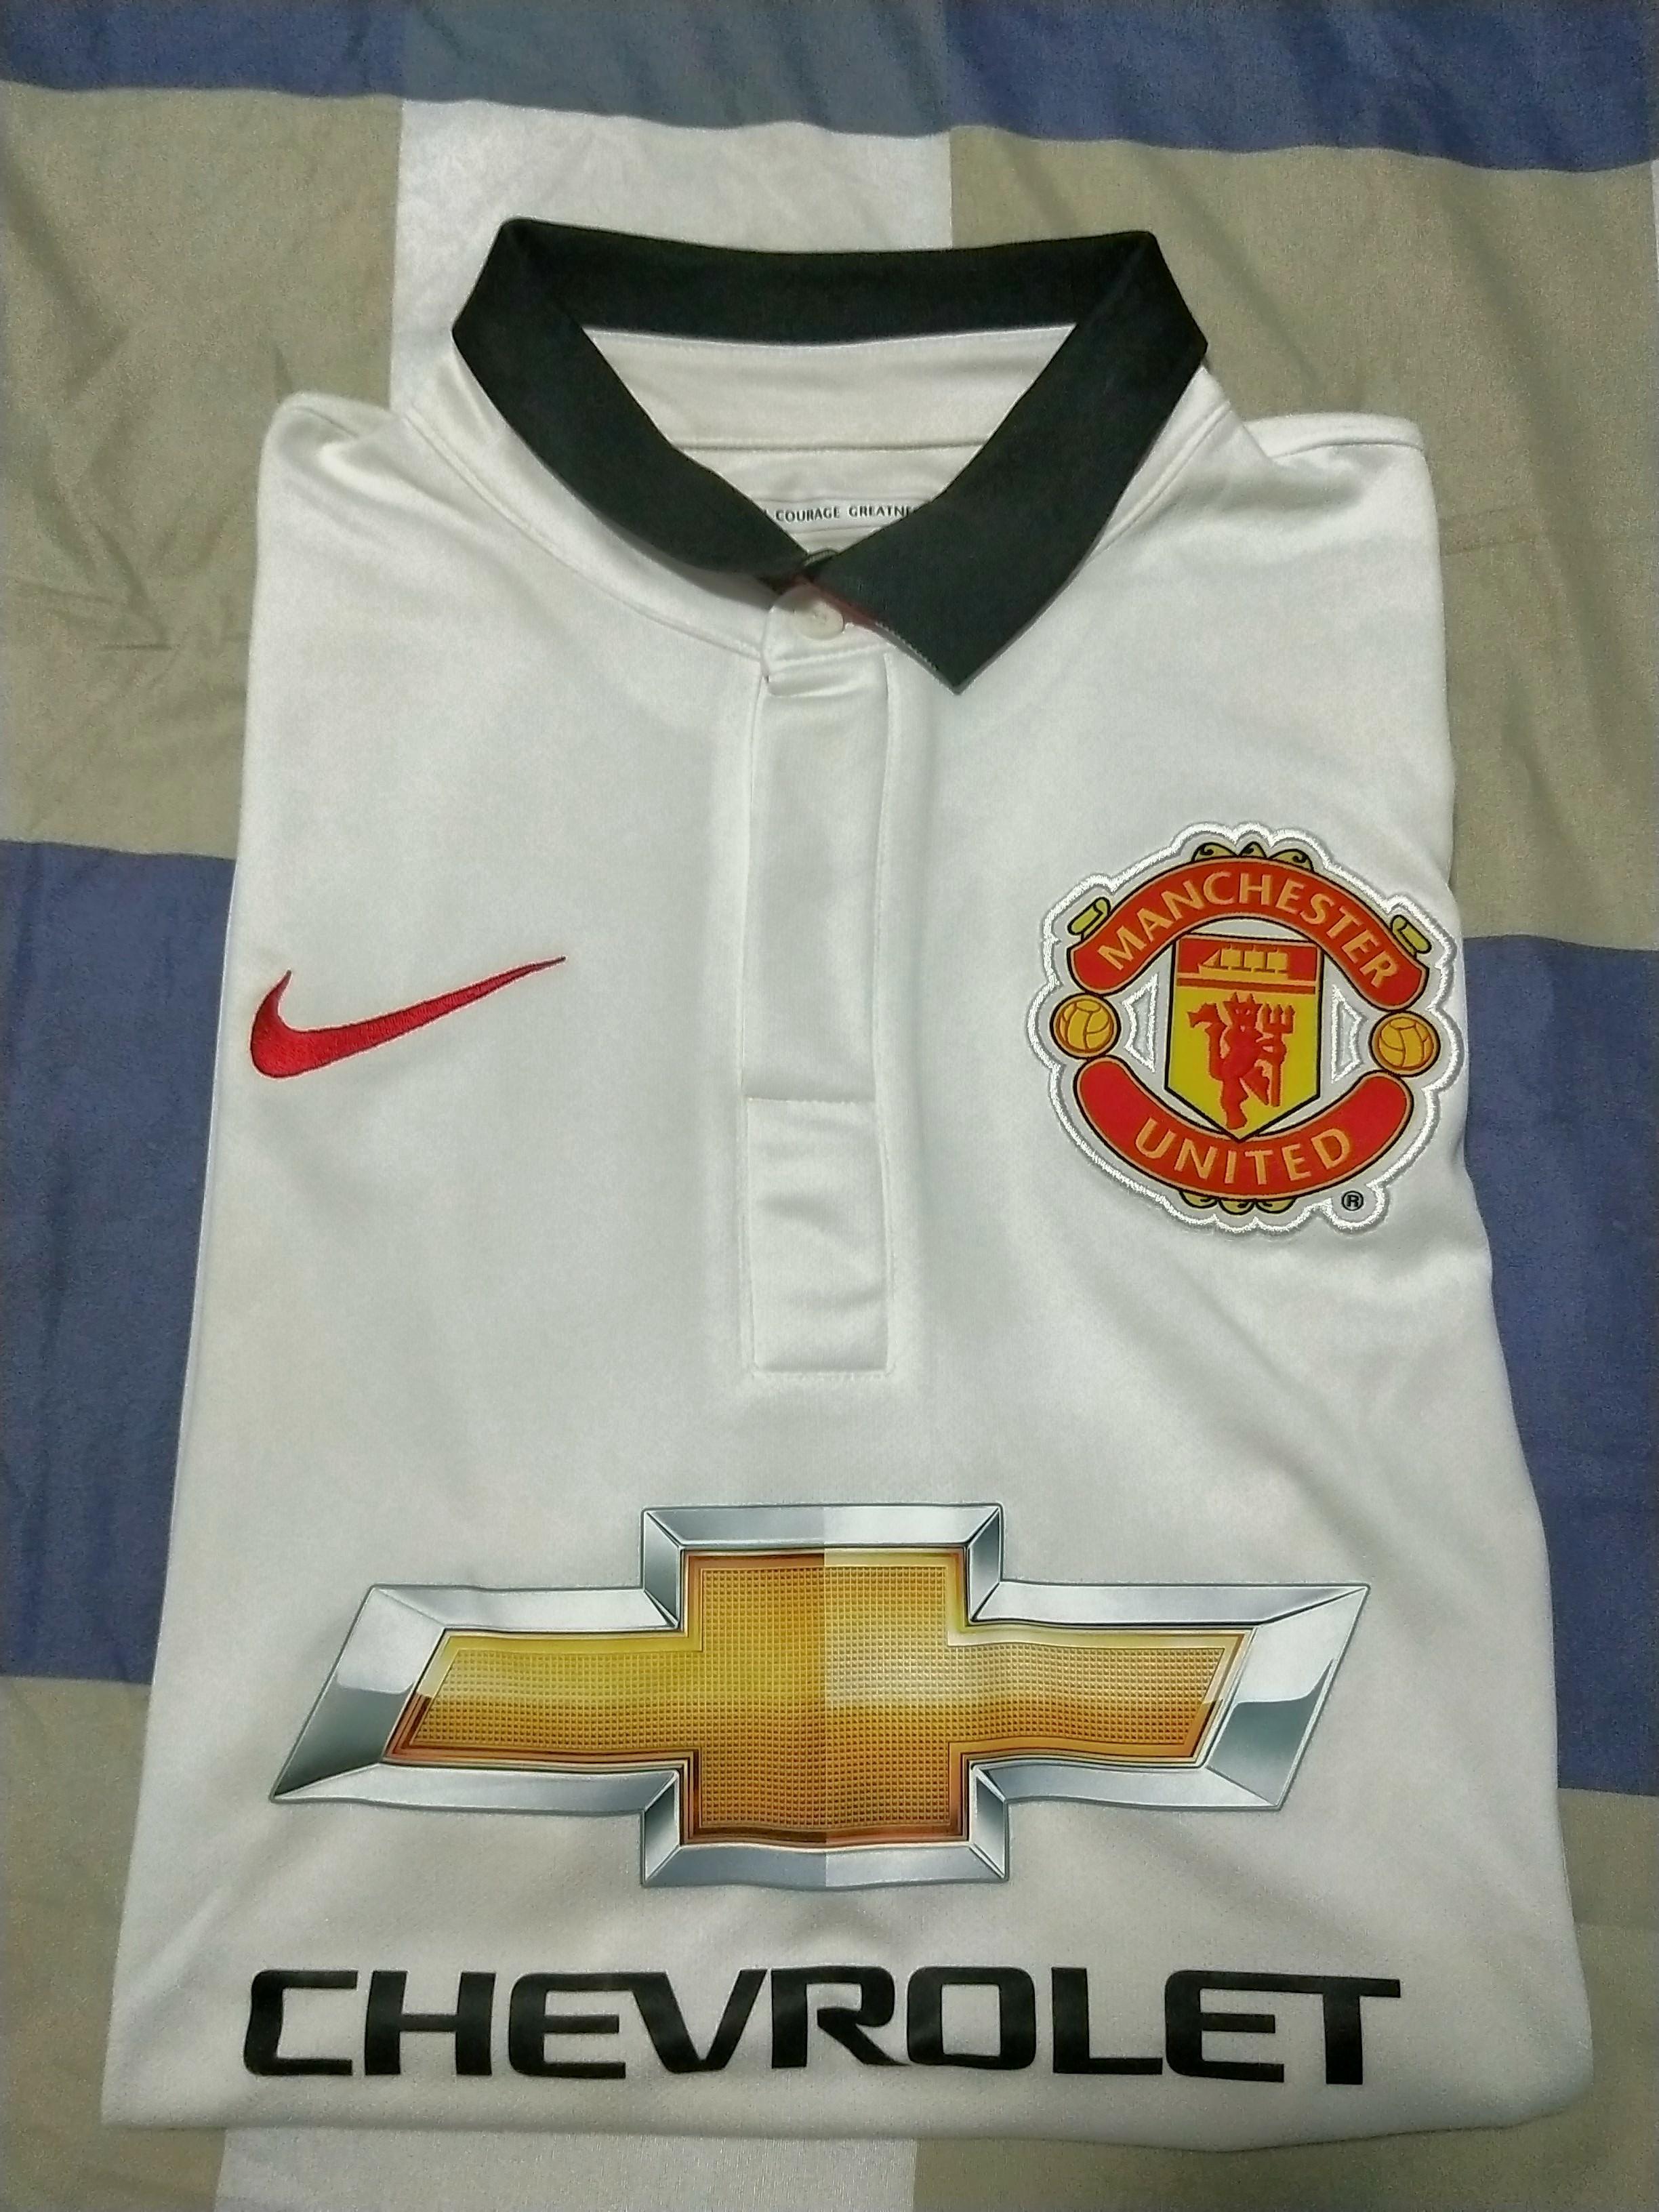 online store 3cc38 93b8e Manchester Utd 2014/2015 Away Replica Jersey, Sports, Sports ...